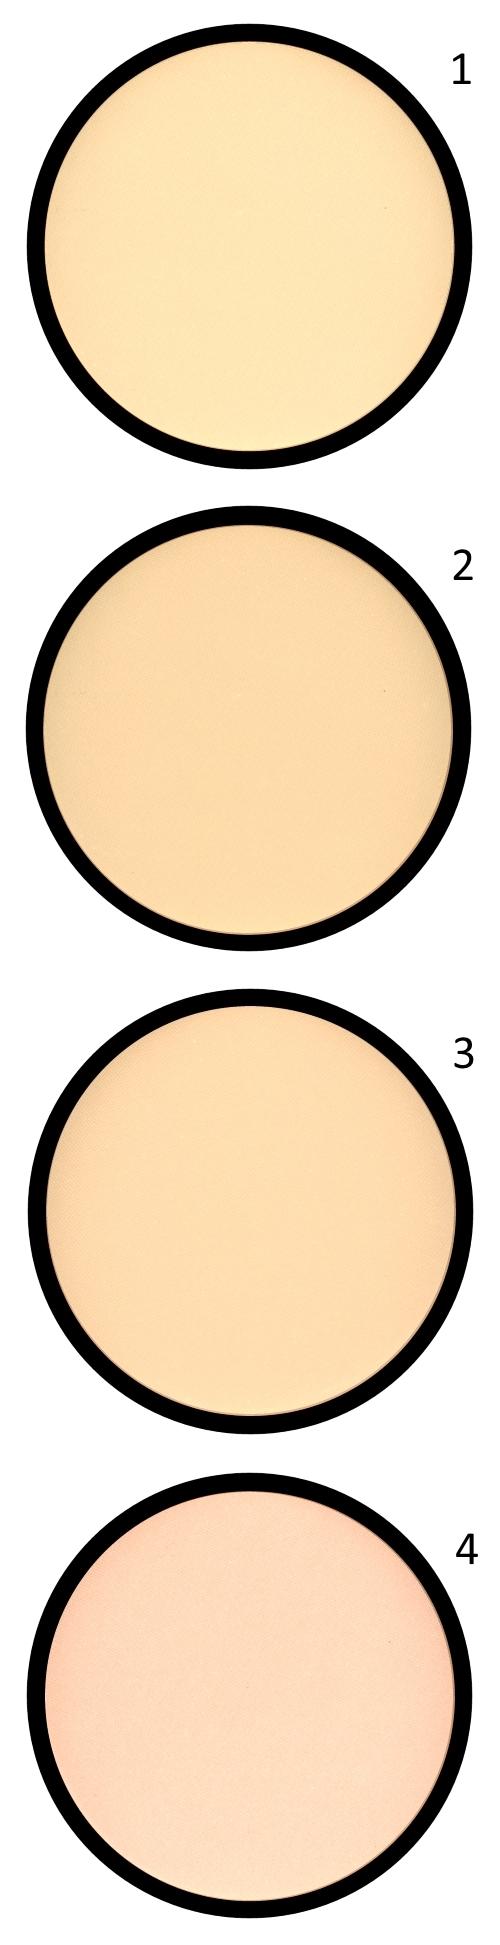 D'donna Polvo Compacto Silk Skin